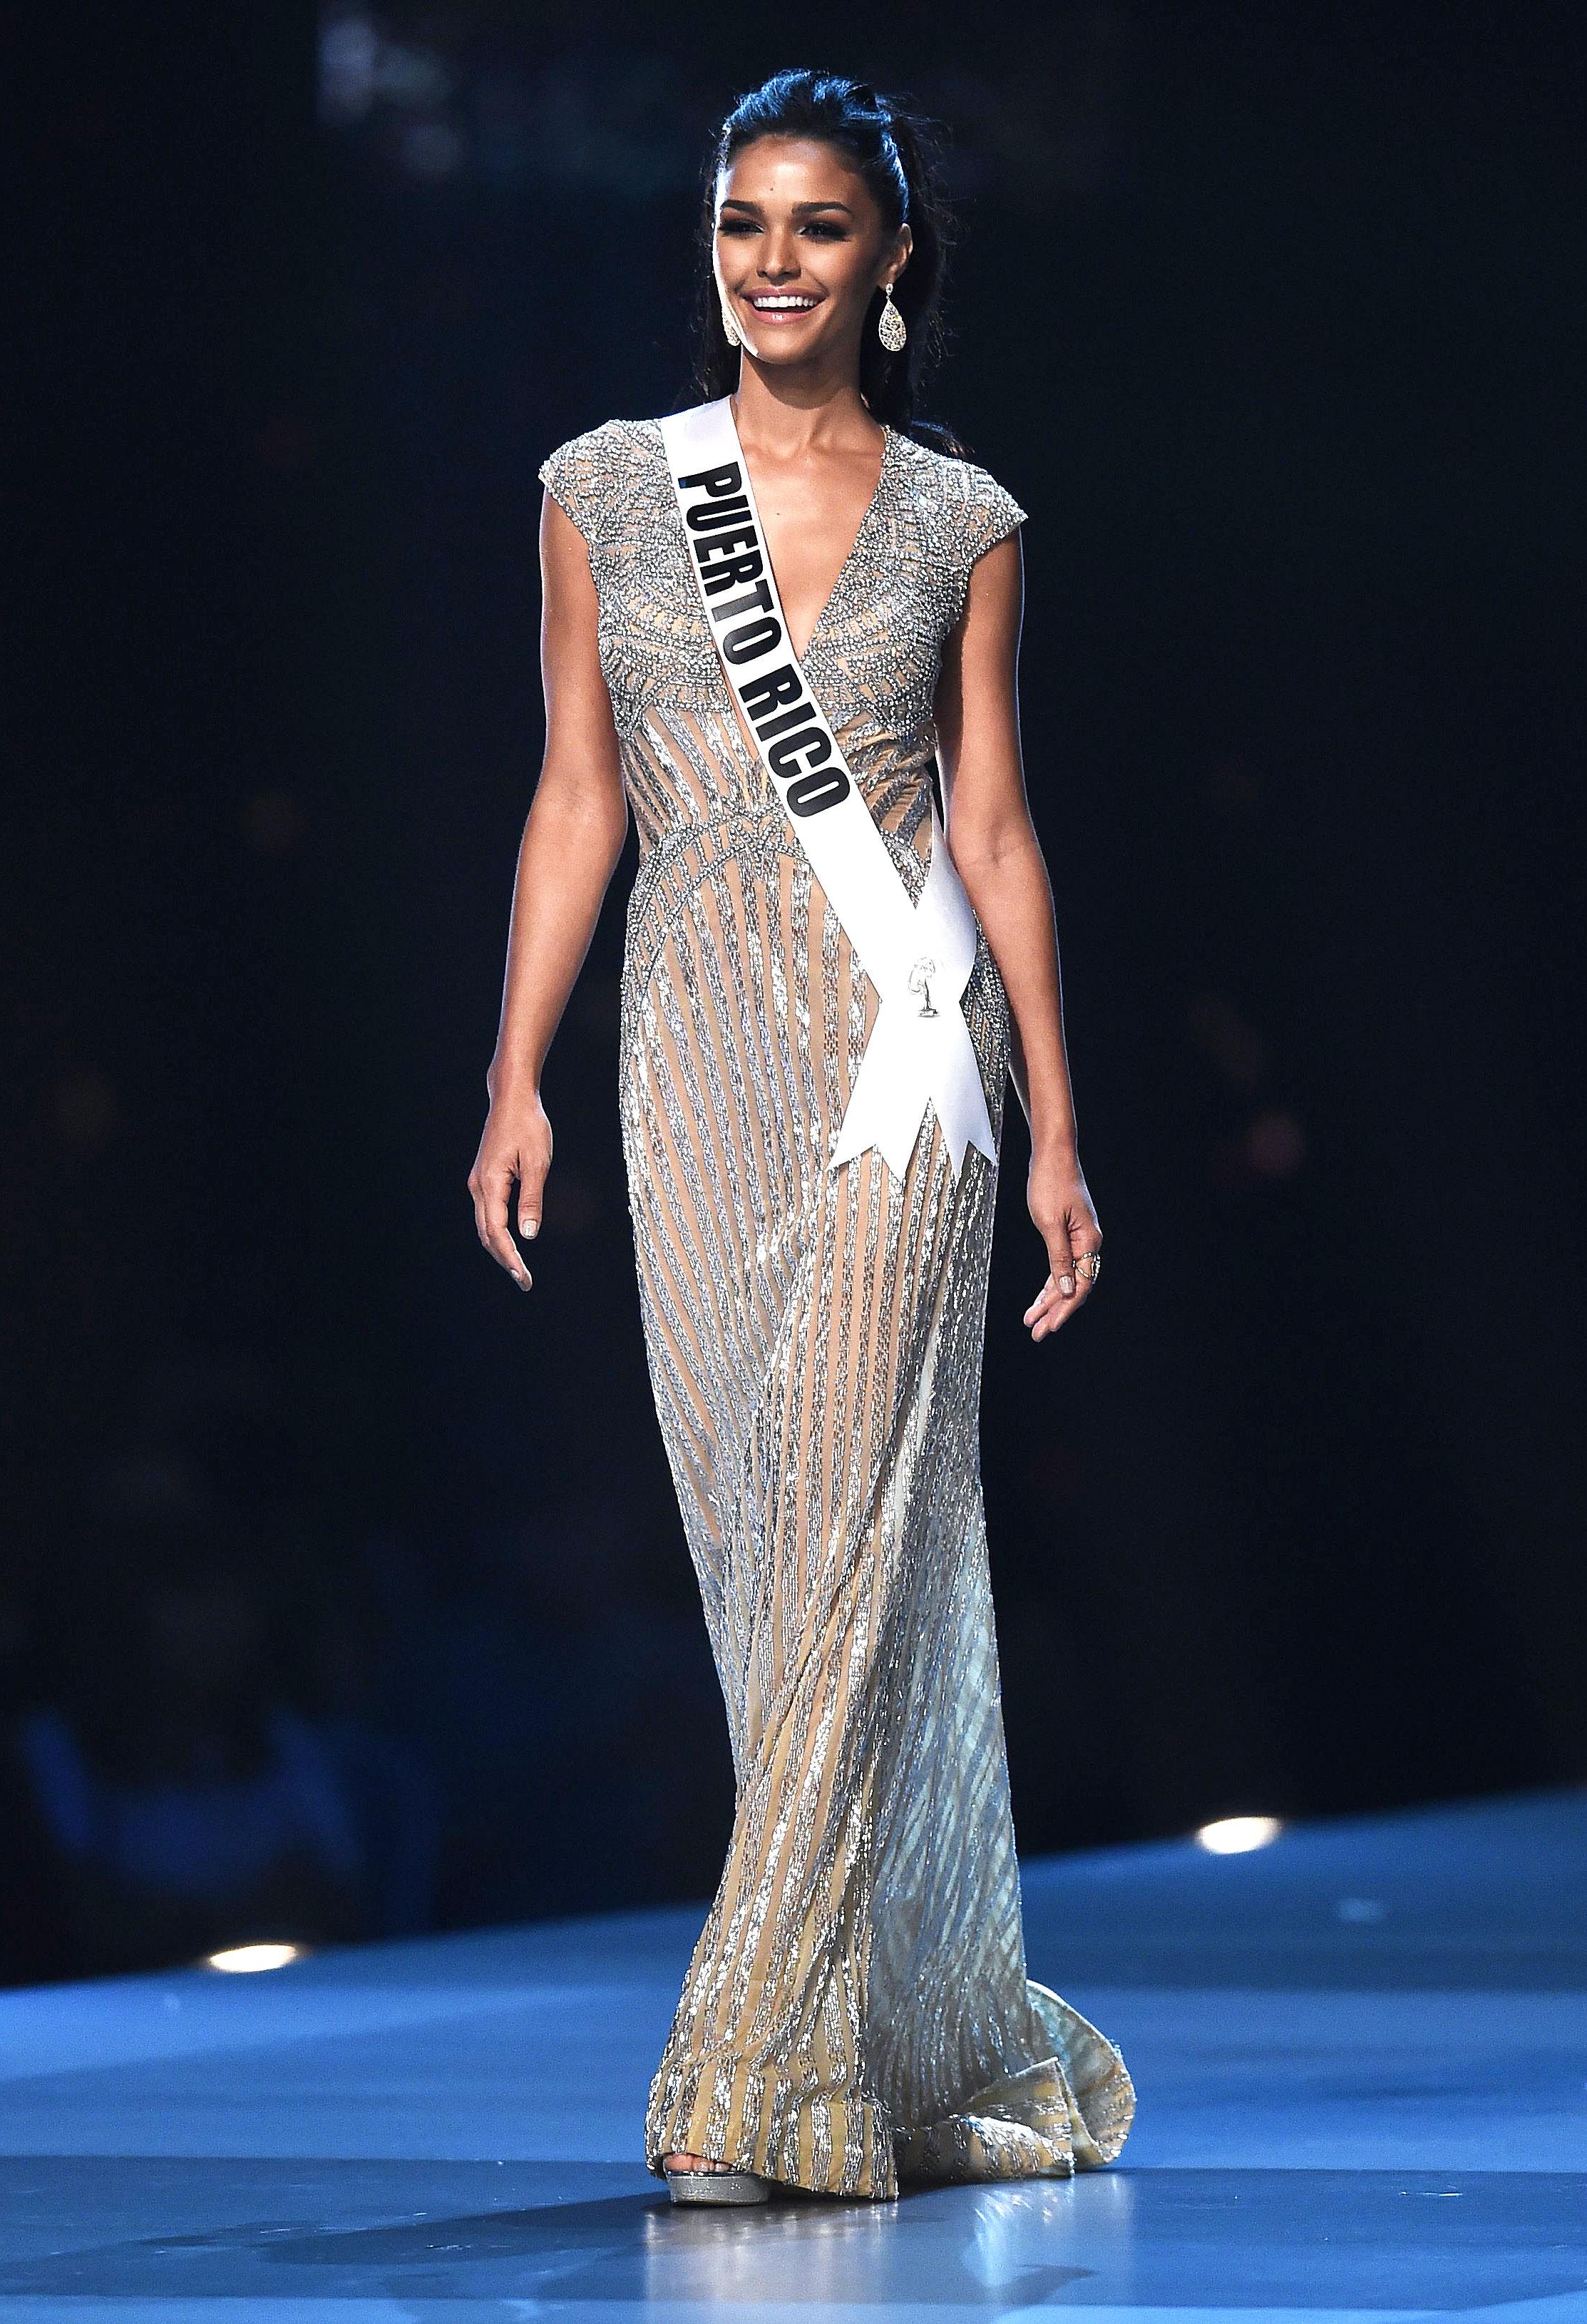 1-Miss-Puerto-Rico-Kiara-Ortega-miss-universe - In a shimmering floor-length gown.